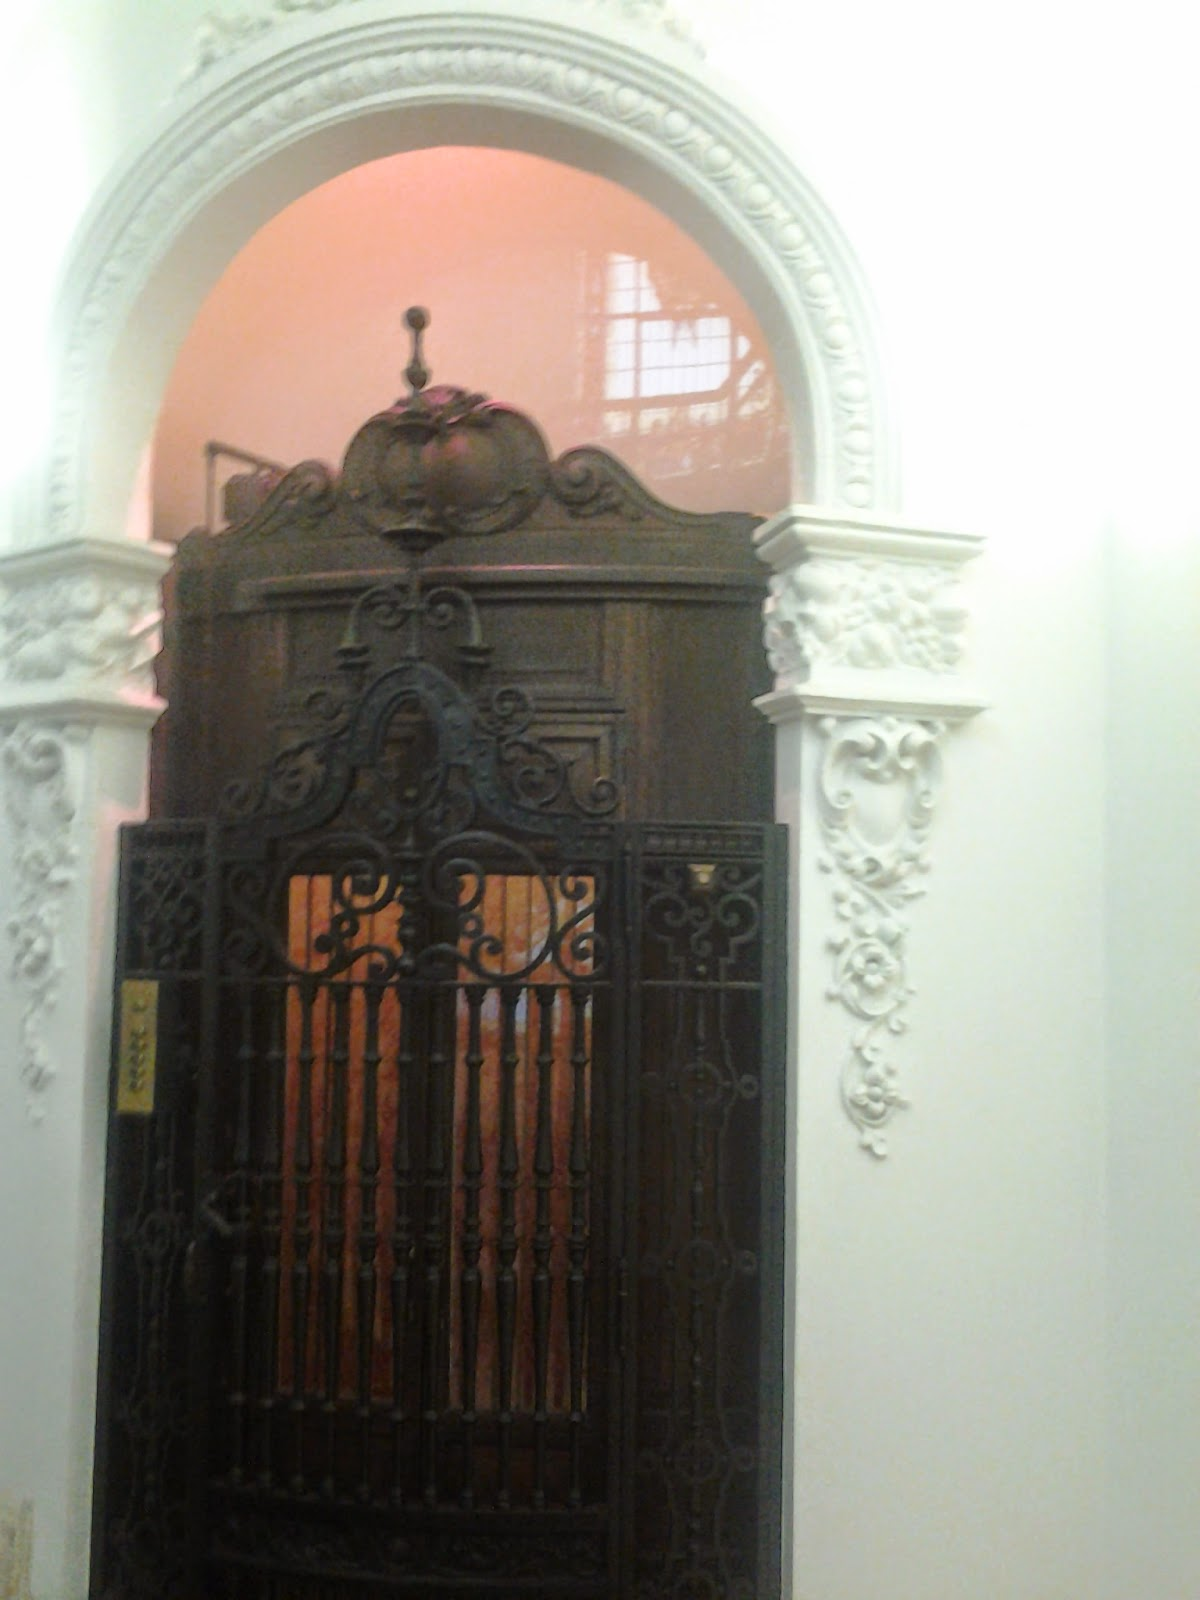 vivienda madrid calle alfonso xii: